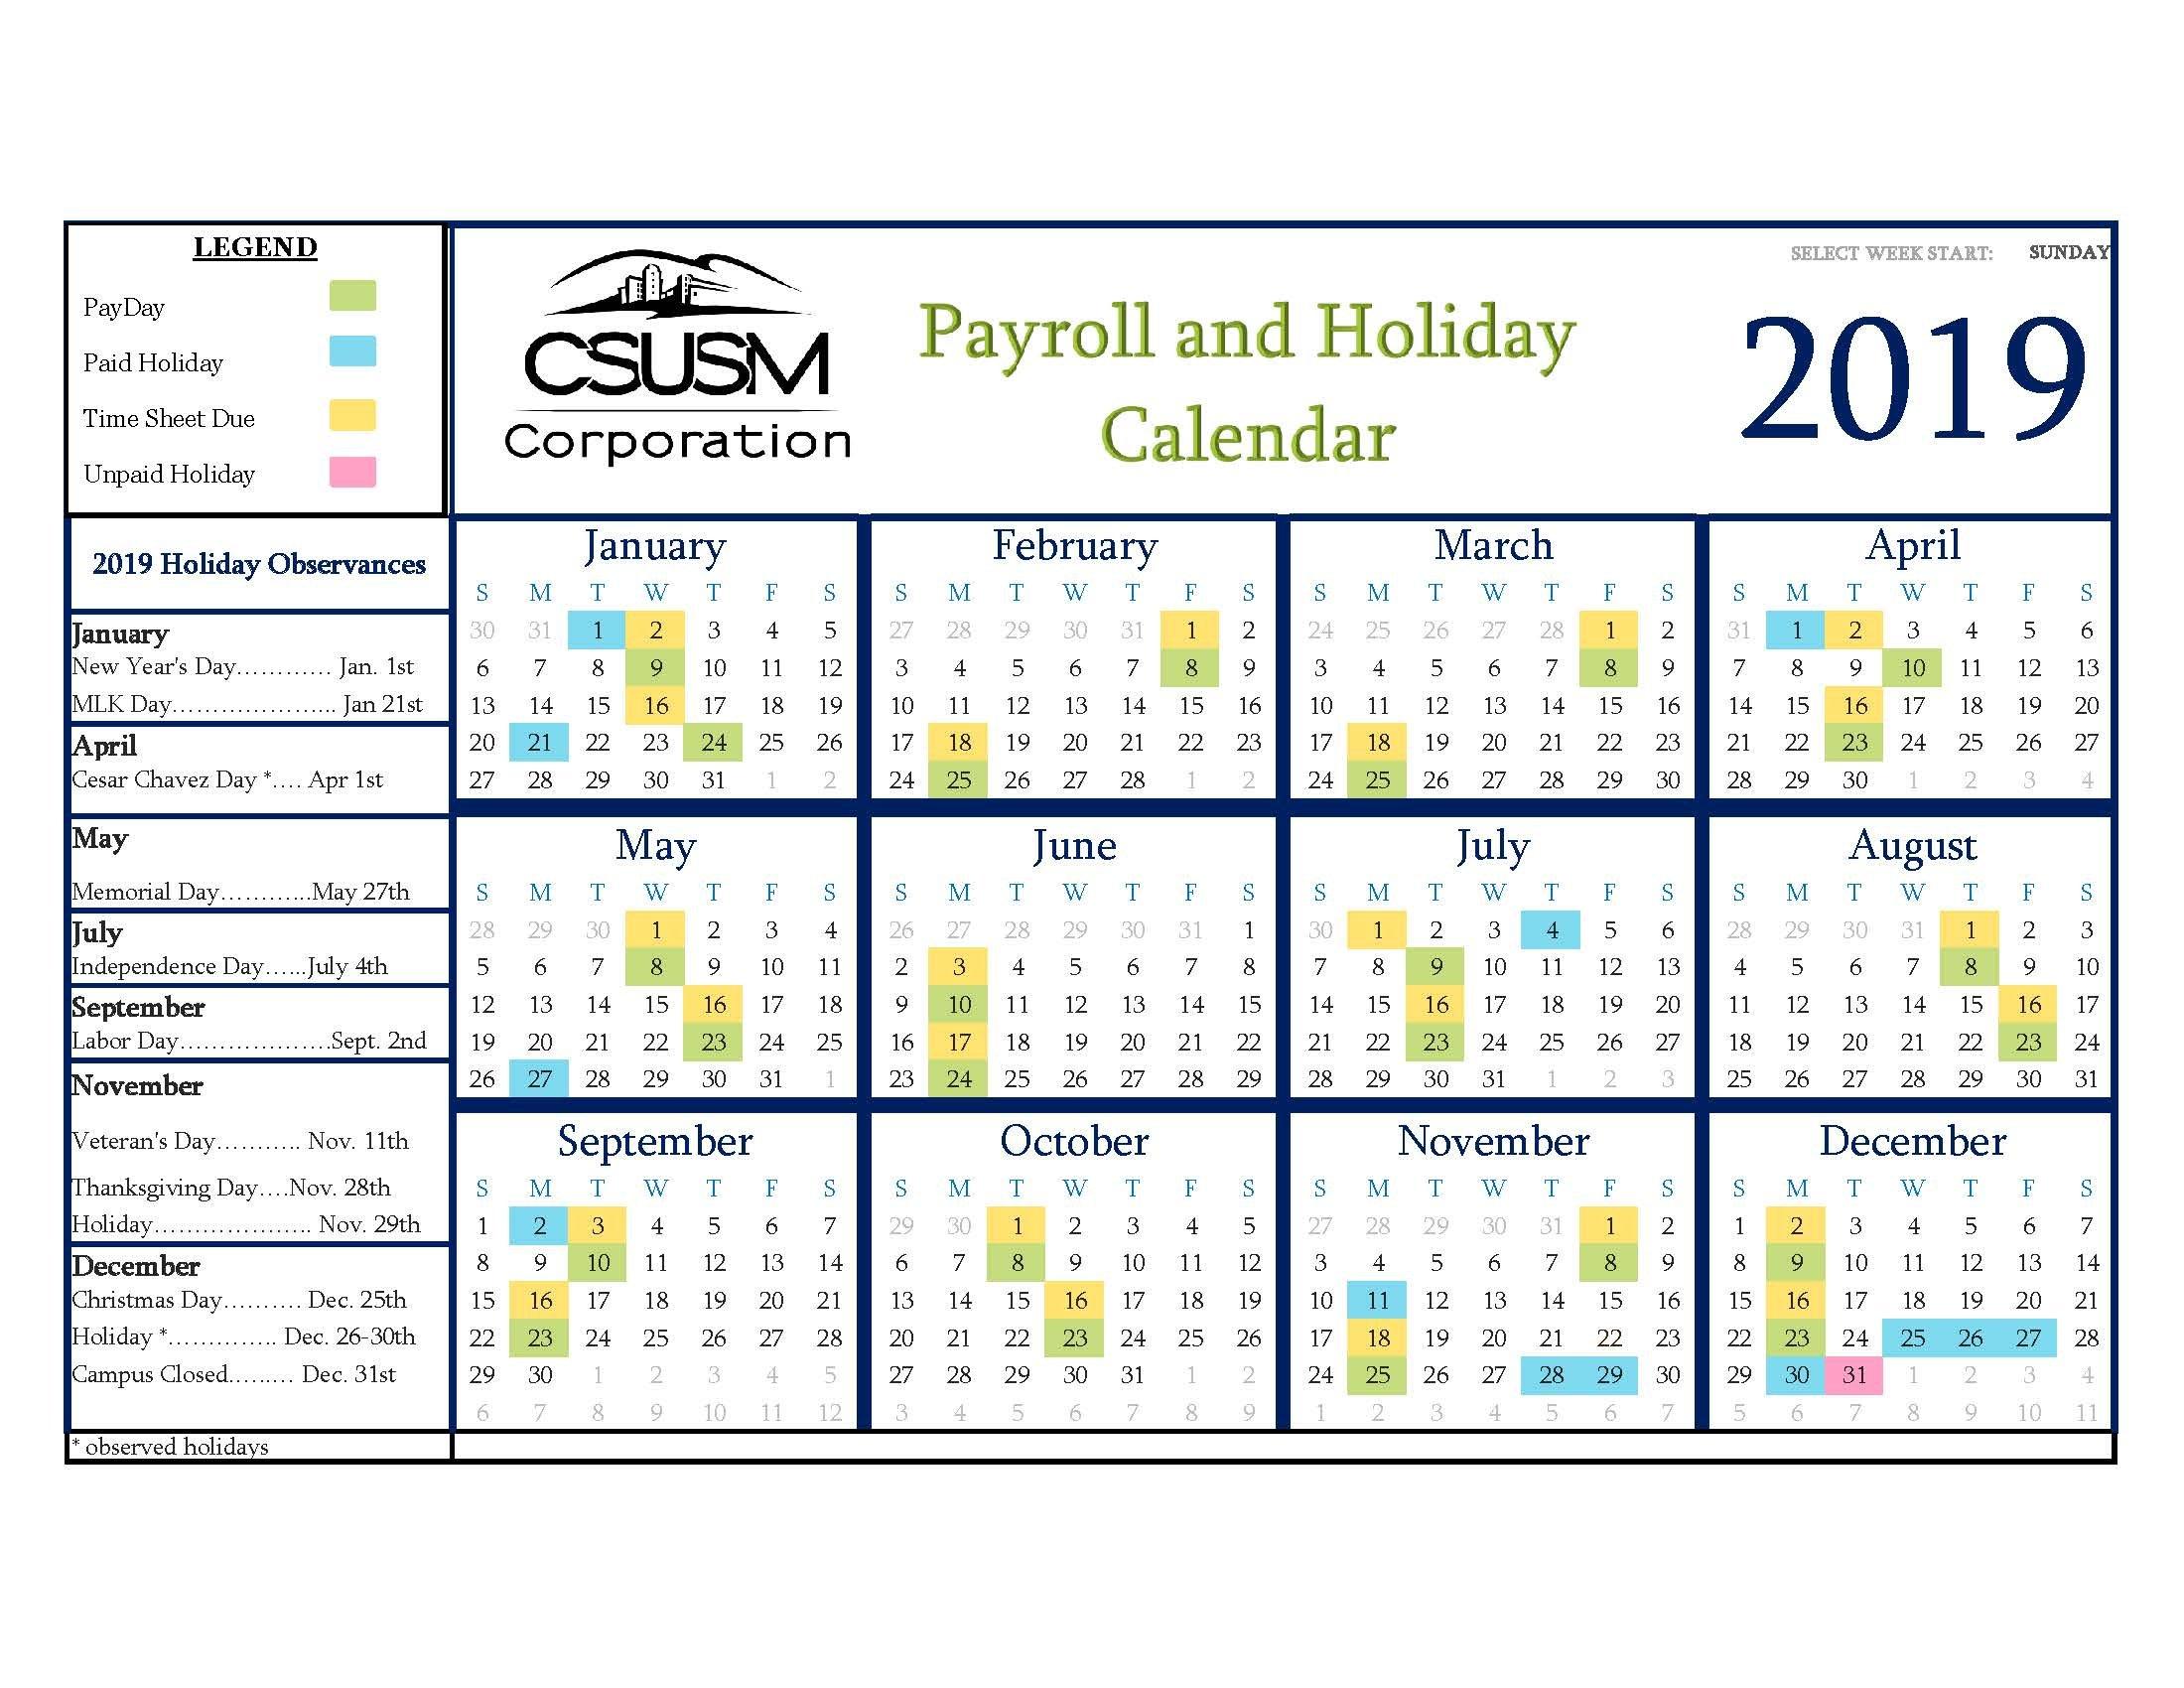 Csusm Corporation Human Resources & Payroll Services Human Resource Vacation Calendars